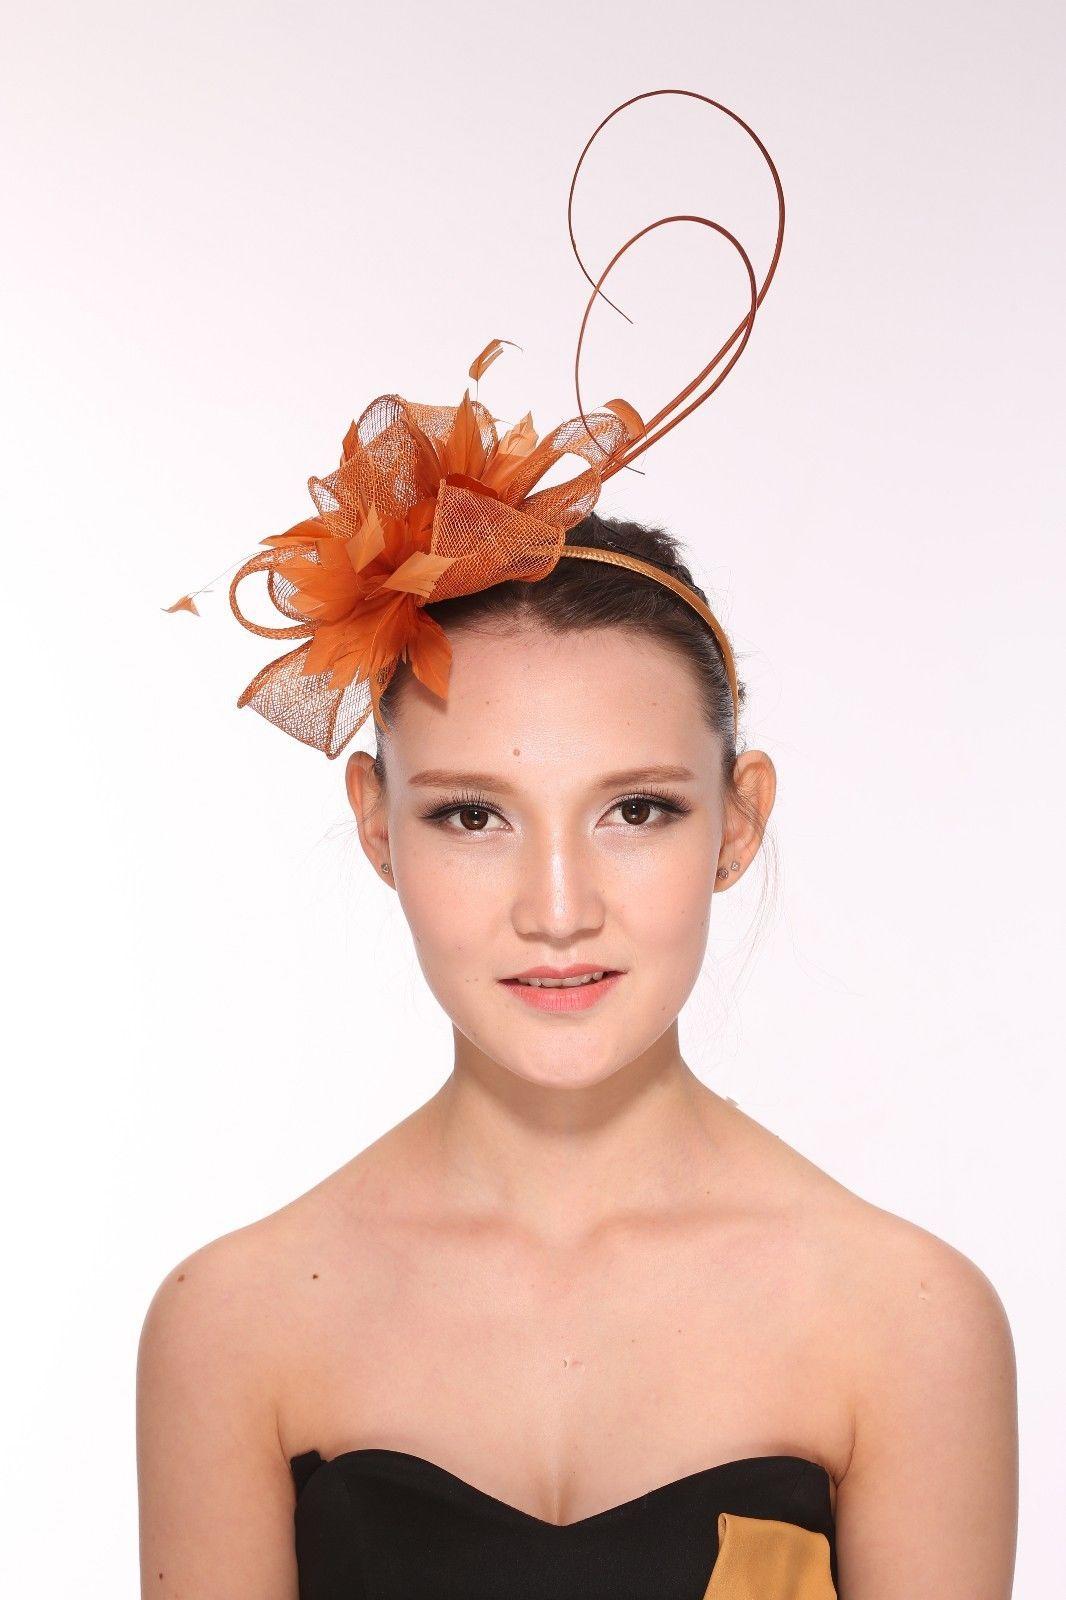 821050e9916c6 Kentucky Derby Wedding Feather Sinamay Headband Fascinator Hat Orange